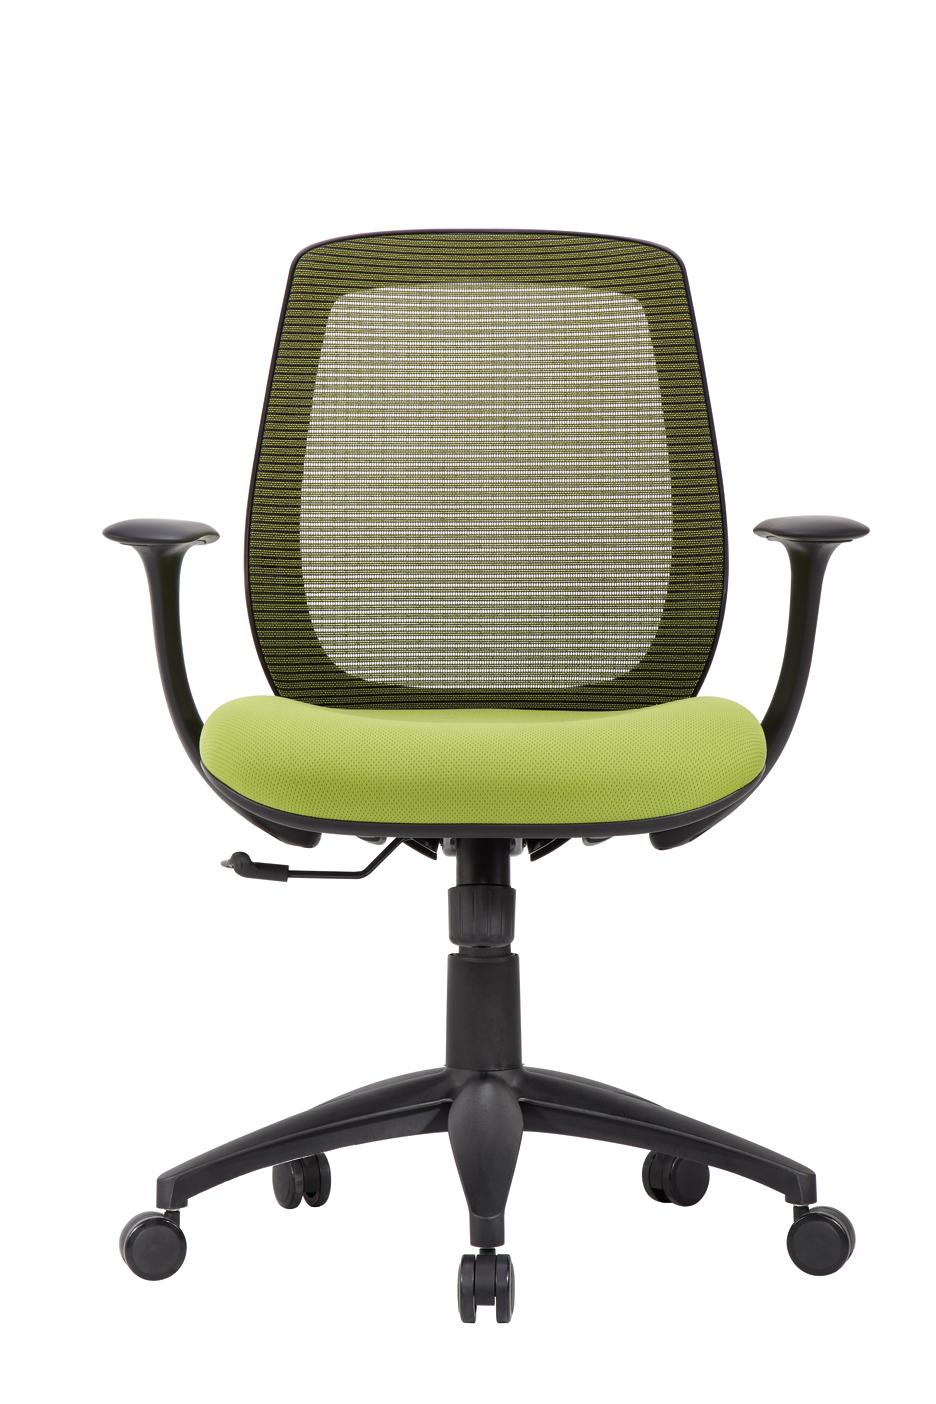 revolving chair manufacturer in lahore folding mattress office furniture workspace pakistan staff